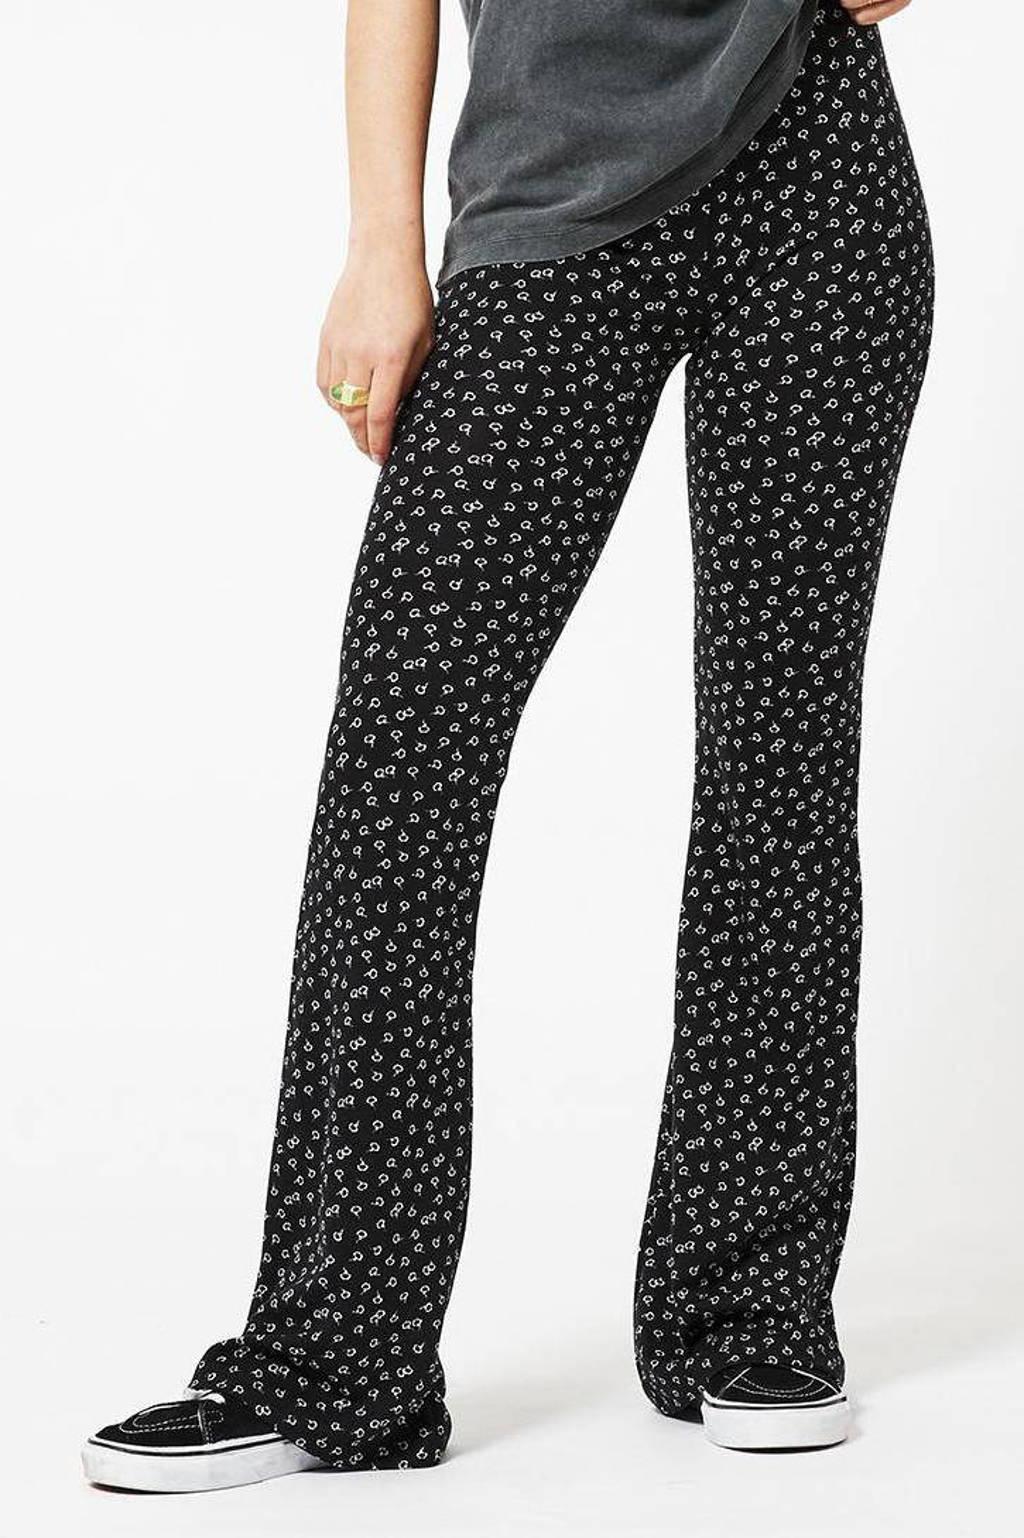 America Today high waist flared broek met all over print zwart, Zwart